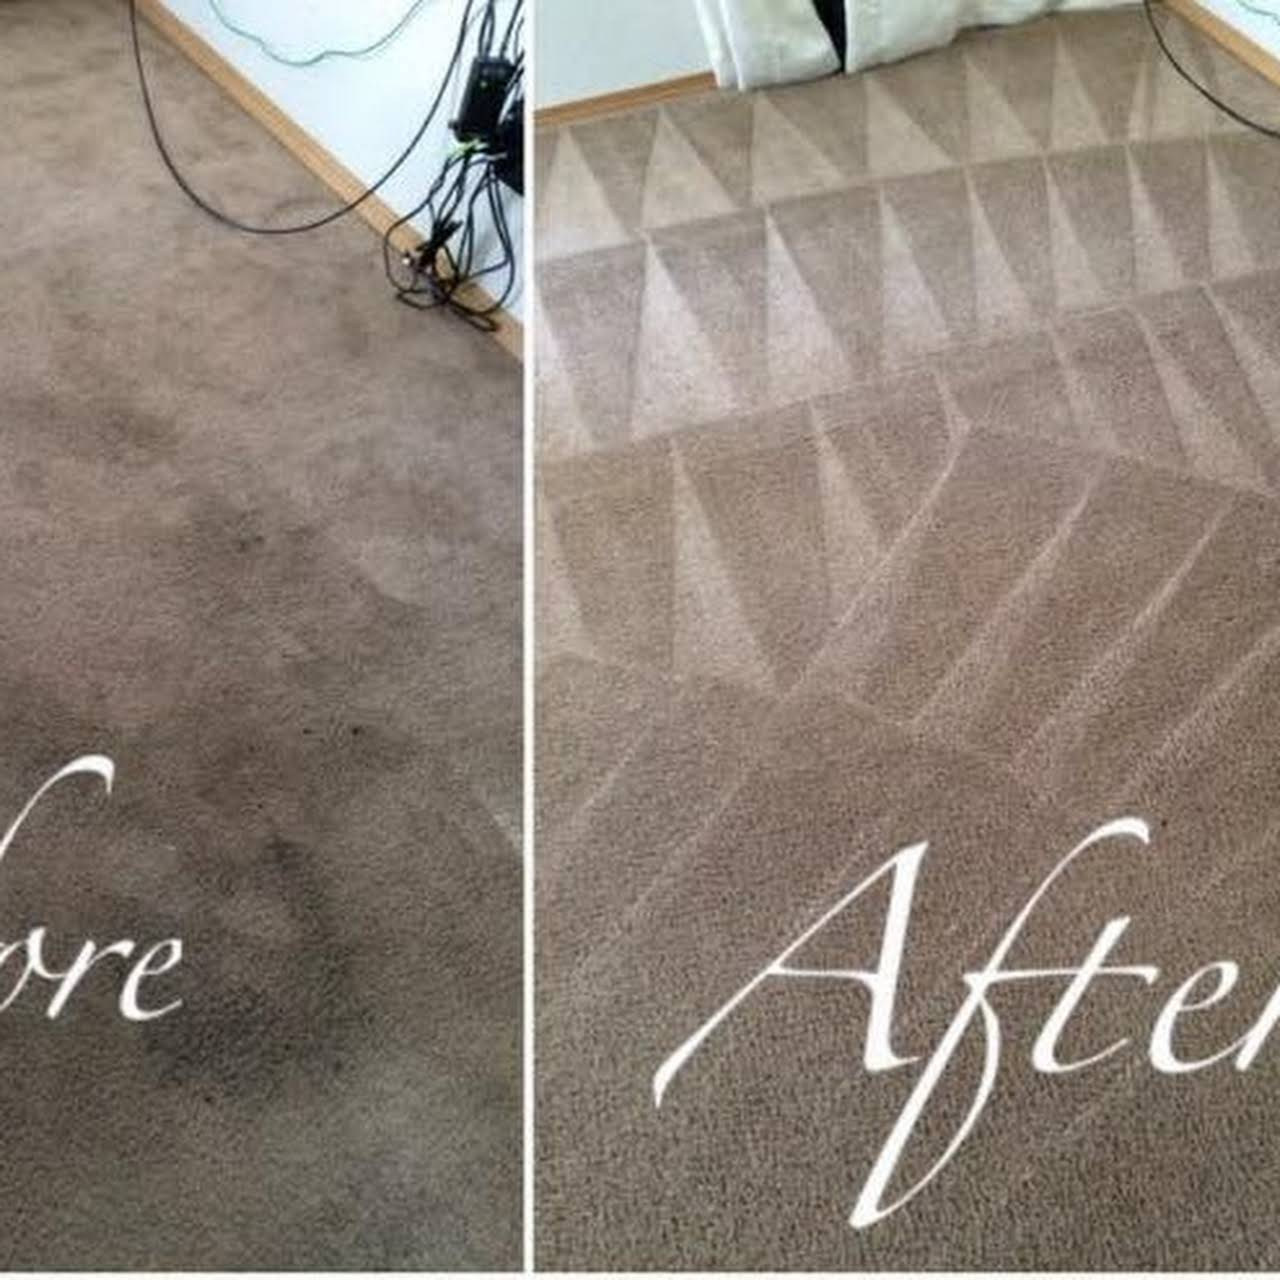 Vielmas Carpet Cleaning Carpet Cleaning Service In Wichita